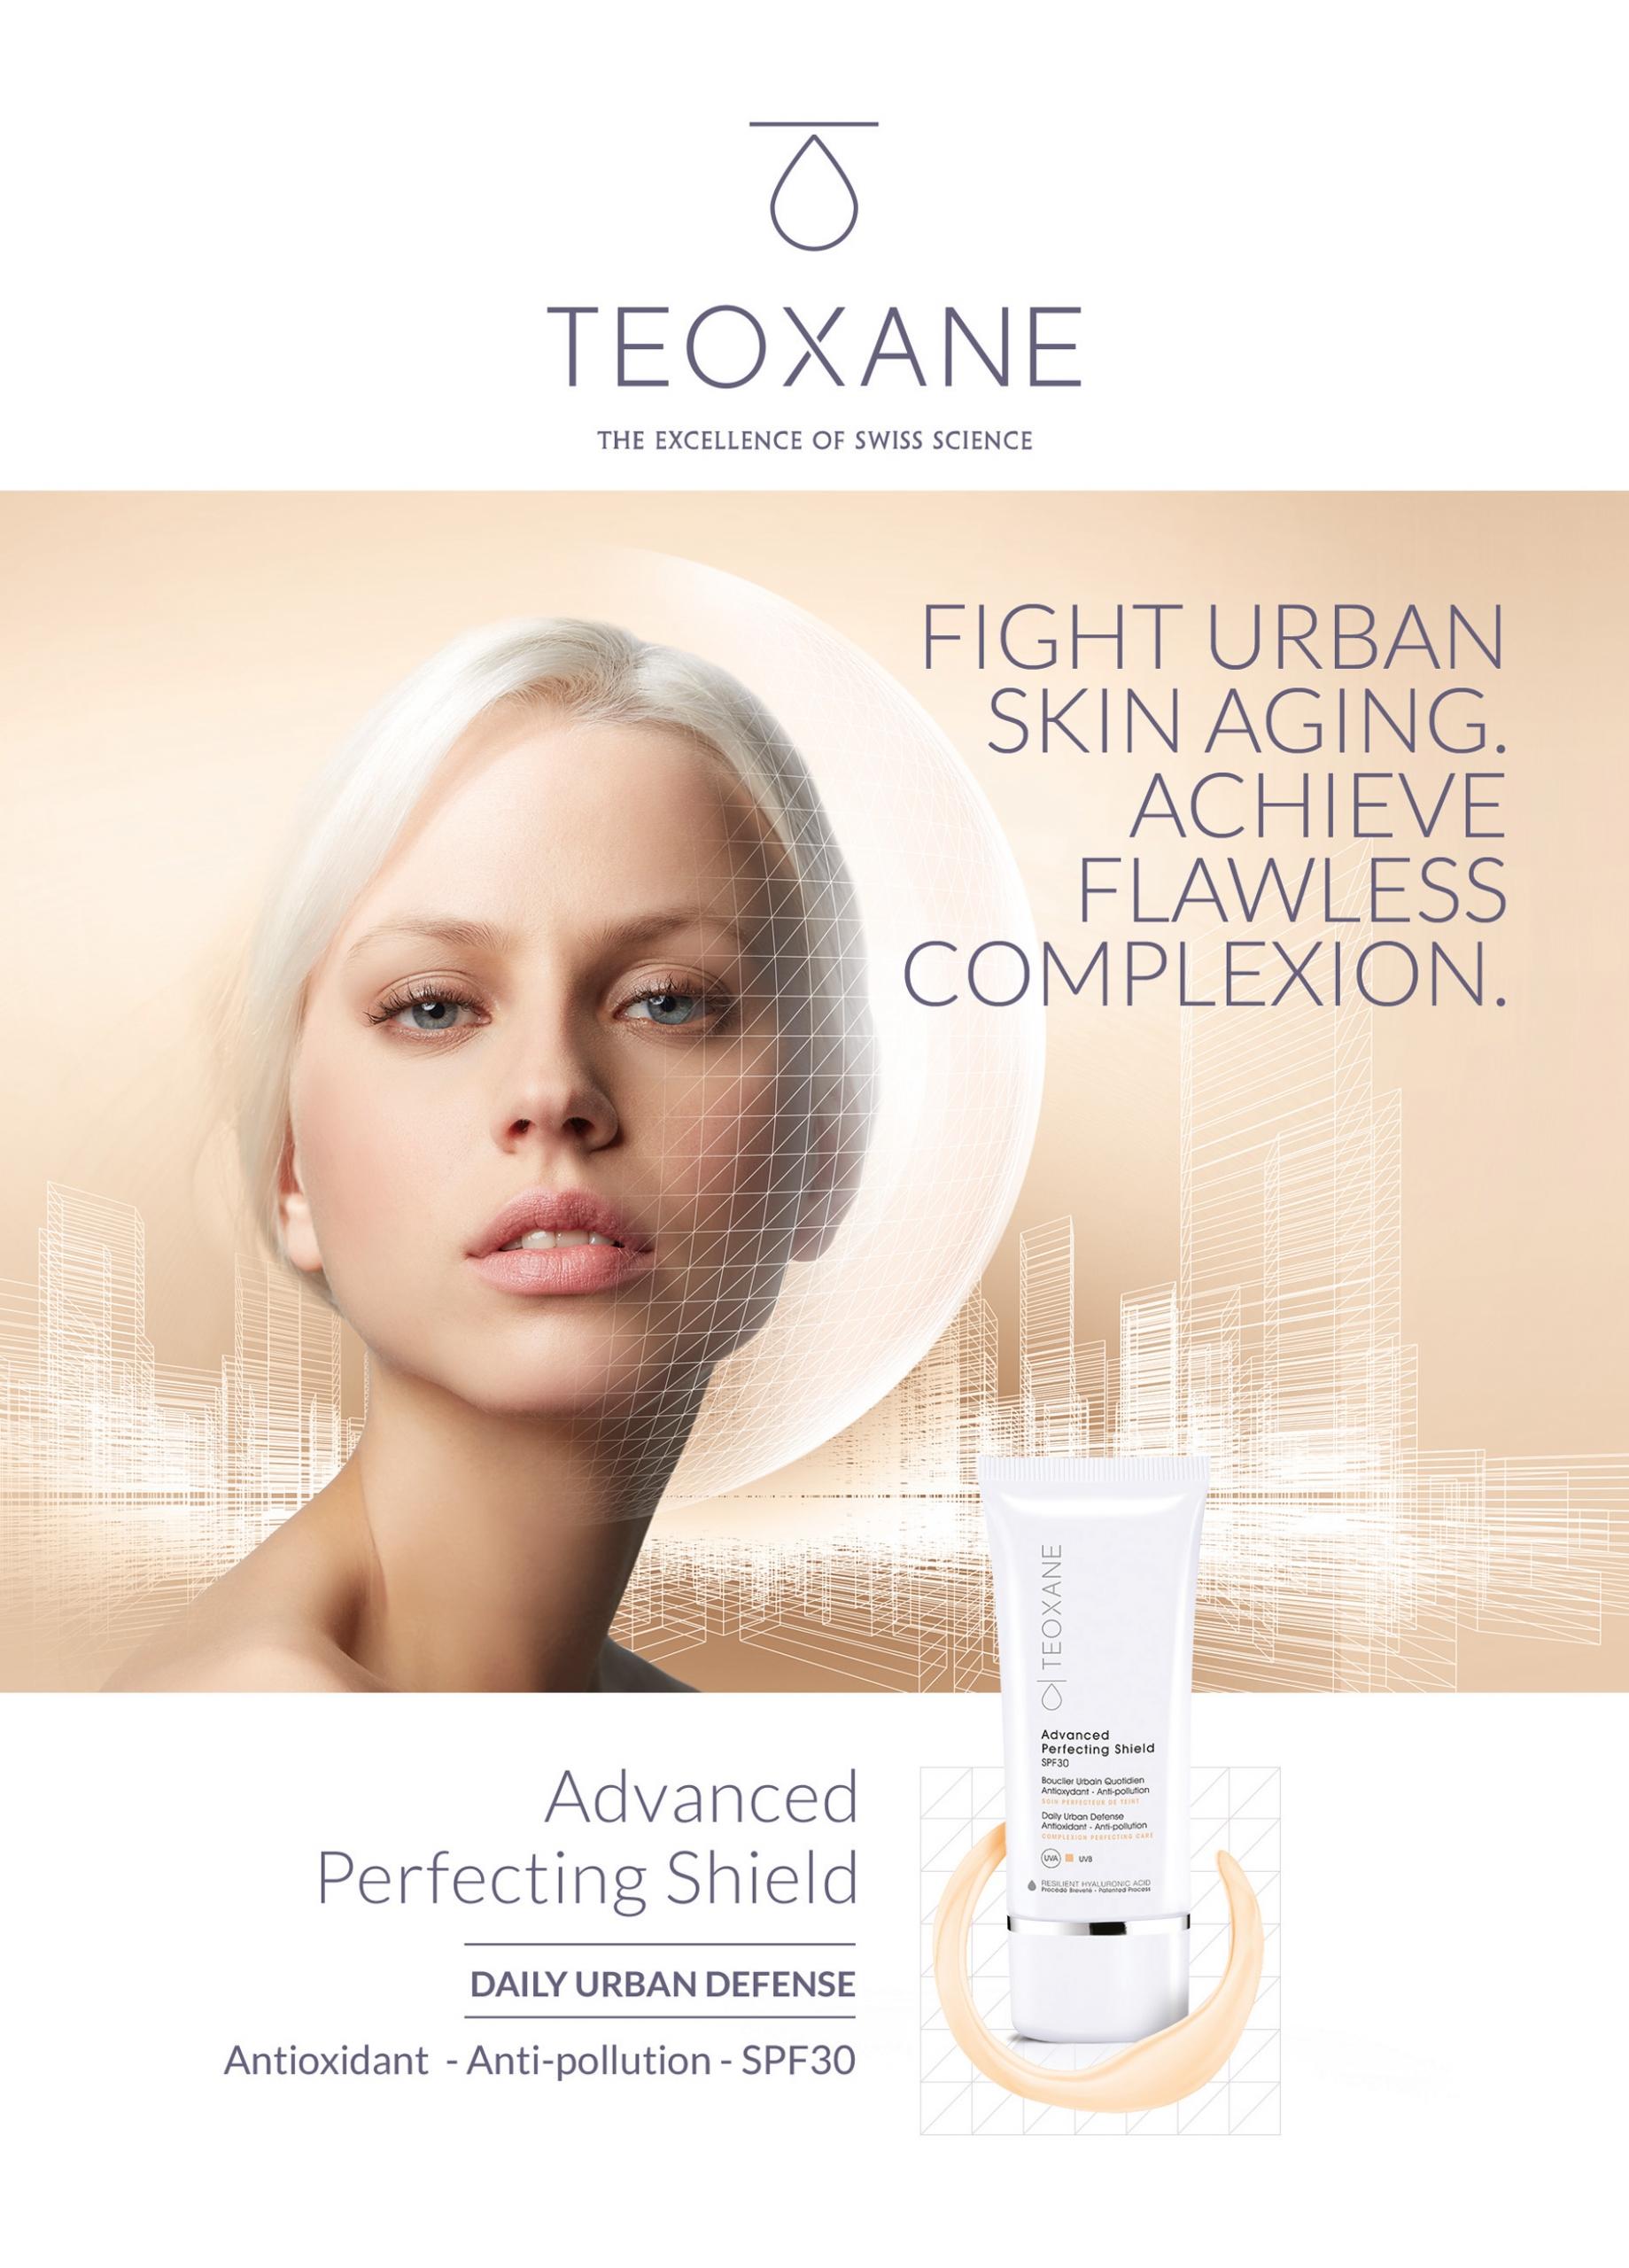 teoxane-visuel-campagne-agence-communication-medical-karma-sante-nice-paris-21